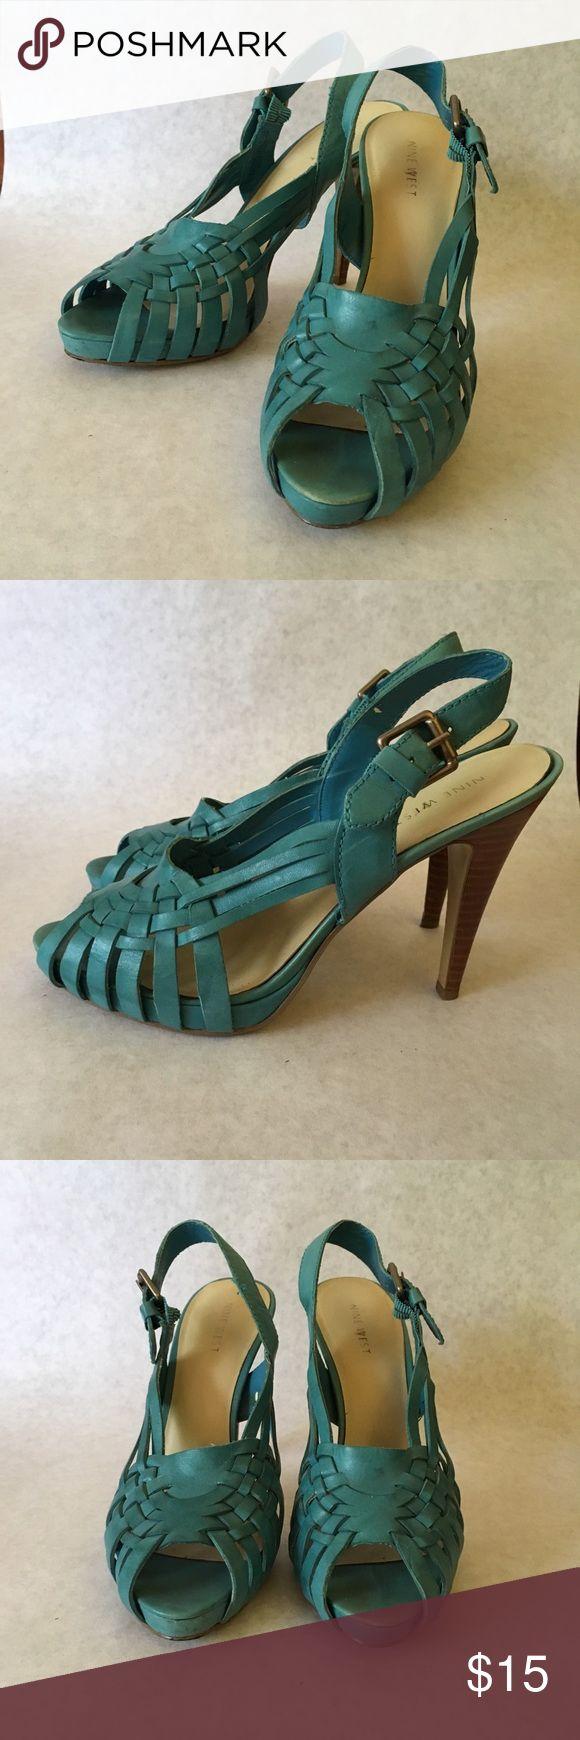 "Bluish teal sandals Bluish teal sandals with woven pattern   4-1/2"" heel, 1"" platform Nine West Shoes Sandals"